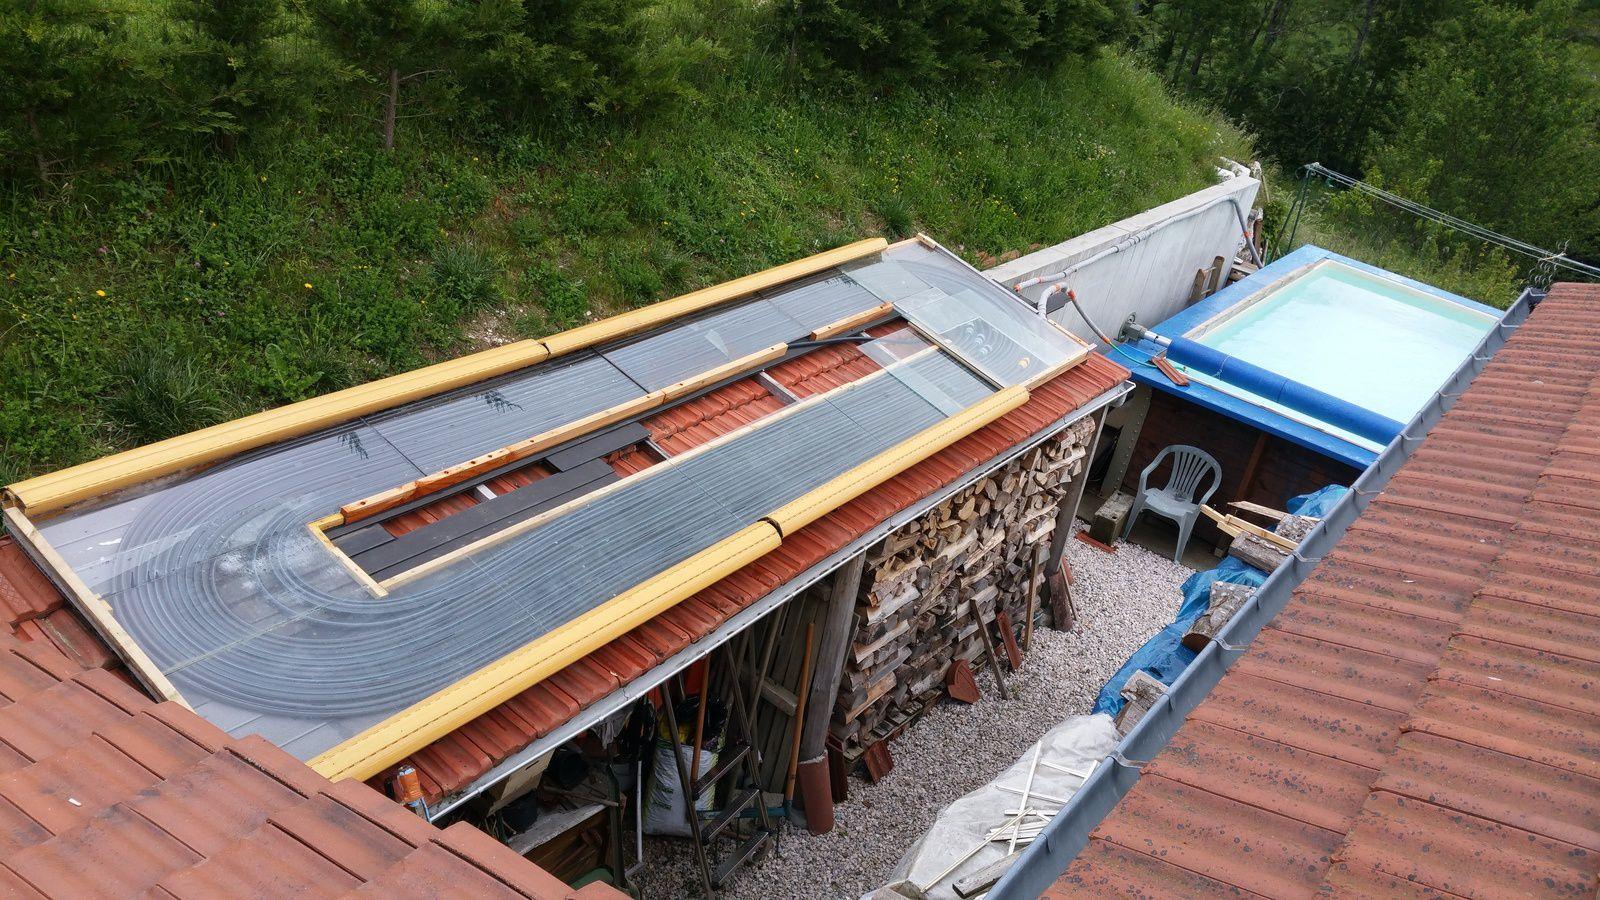 Chauffage solaire pour piscine hommedutempslibre for Kit chauffage solaire pour piscine